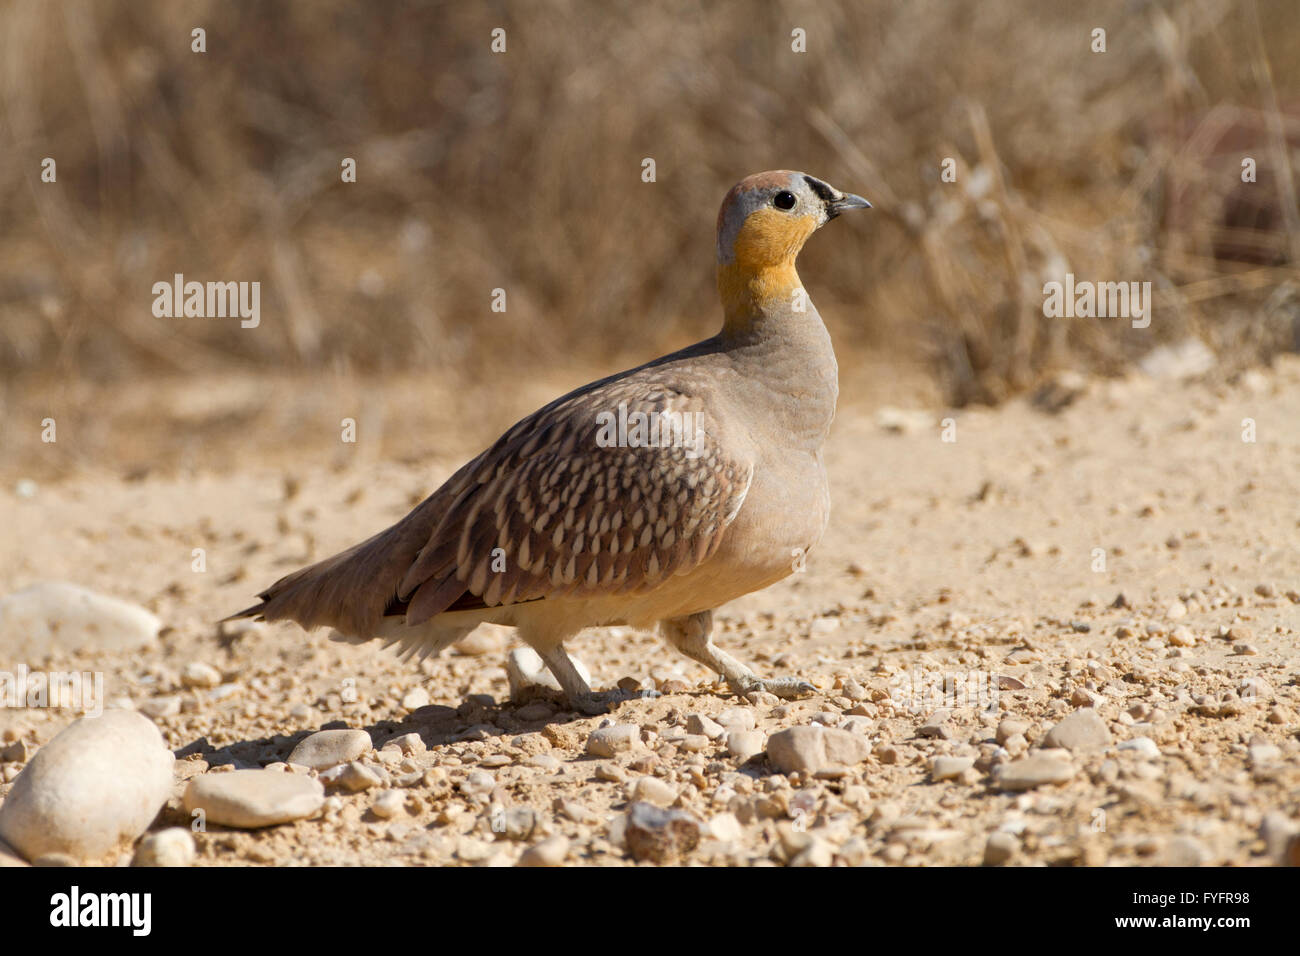 Crowned Sandgrouse (Pterocles coronatus) walking in the desert, negev, israel Stock Photo